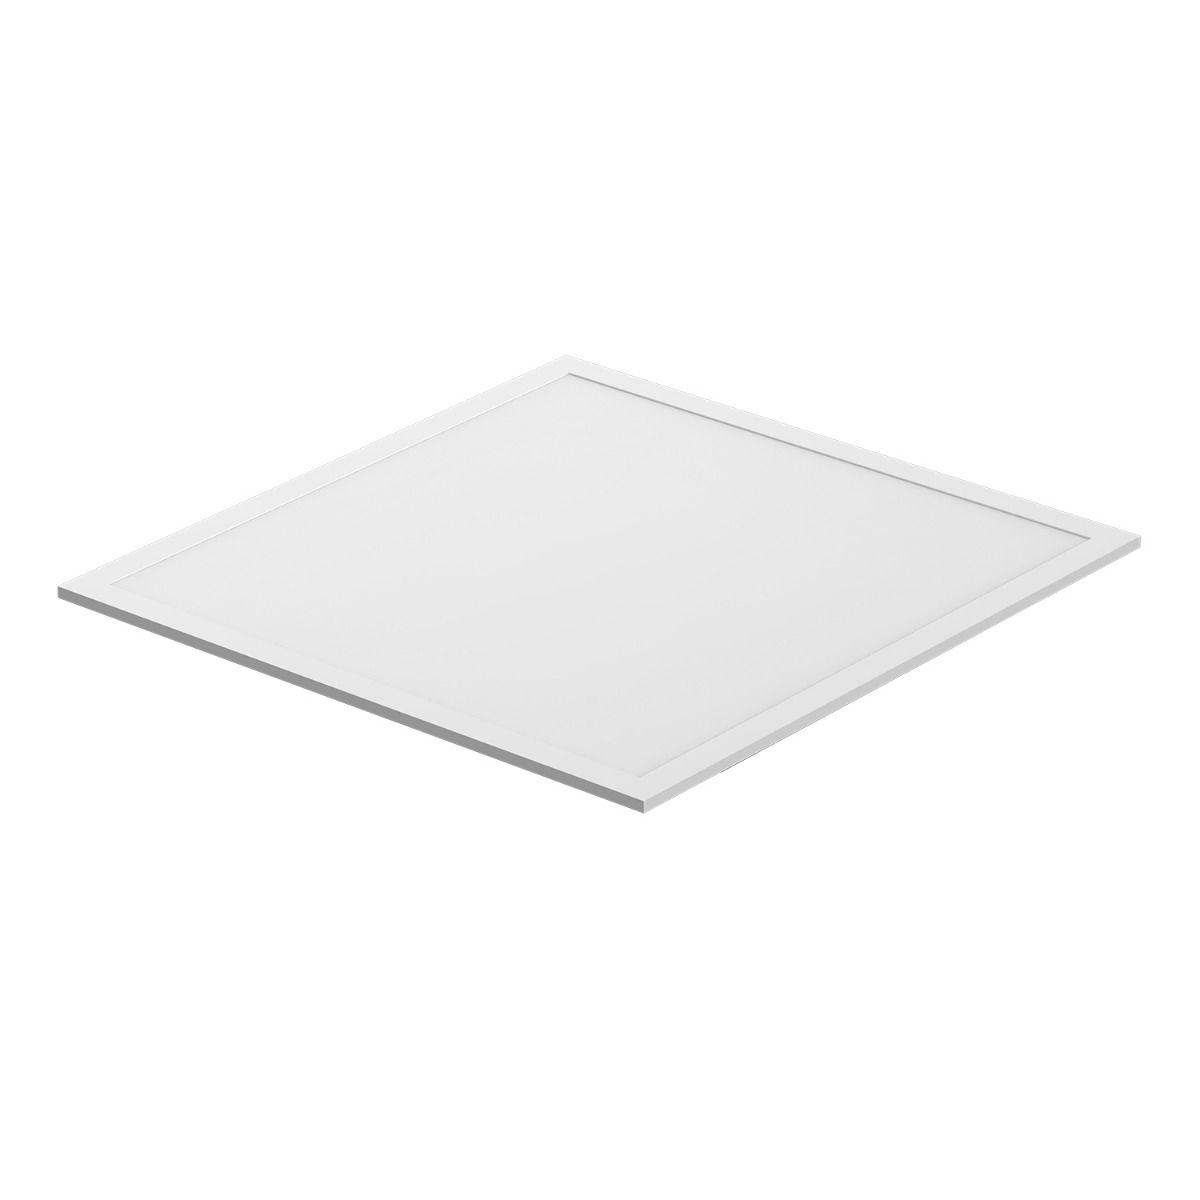 Noxion LED Panel Delta Pro Highlum V2.0 Xitanium DALI 40W 60x60cm 6500K 5480lm UGR <19 | Dali Dimmbar - Tageslichtweiß - Ersatz für 4x18W